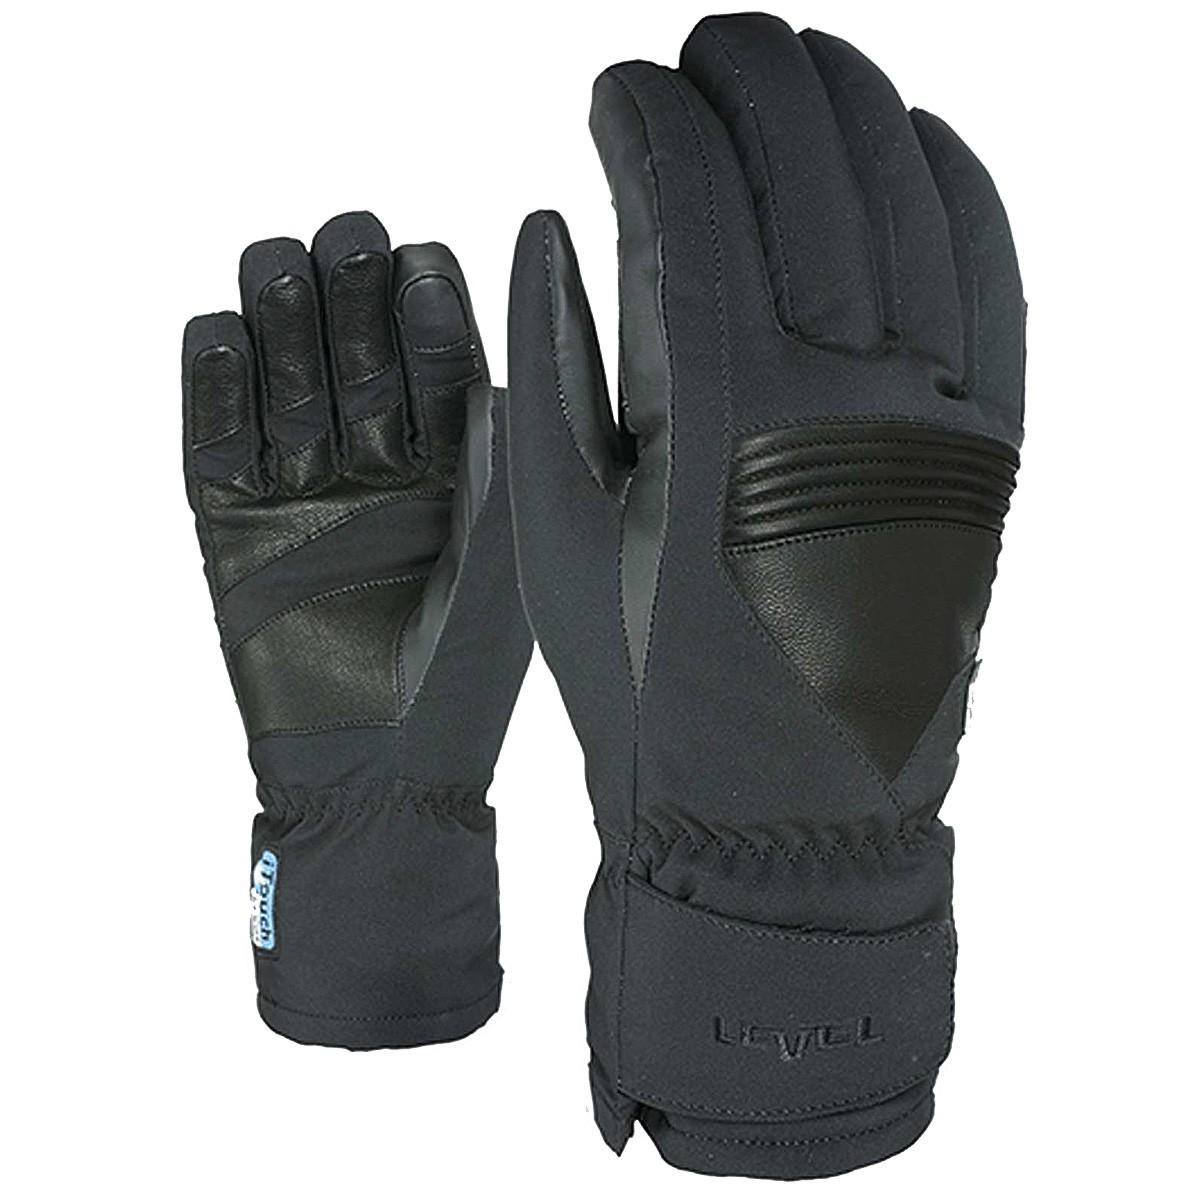 gants ski level radiator gtx homme gants ski sur botteroski. Black Bedroom Furniture Sets. Home Design Ideas